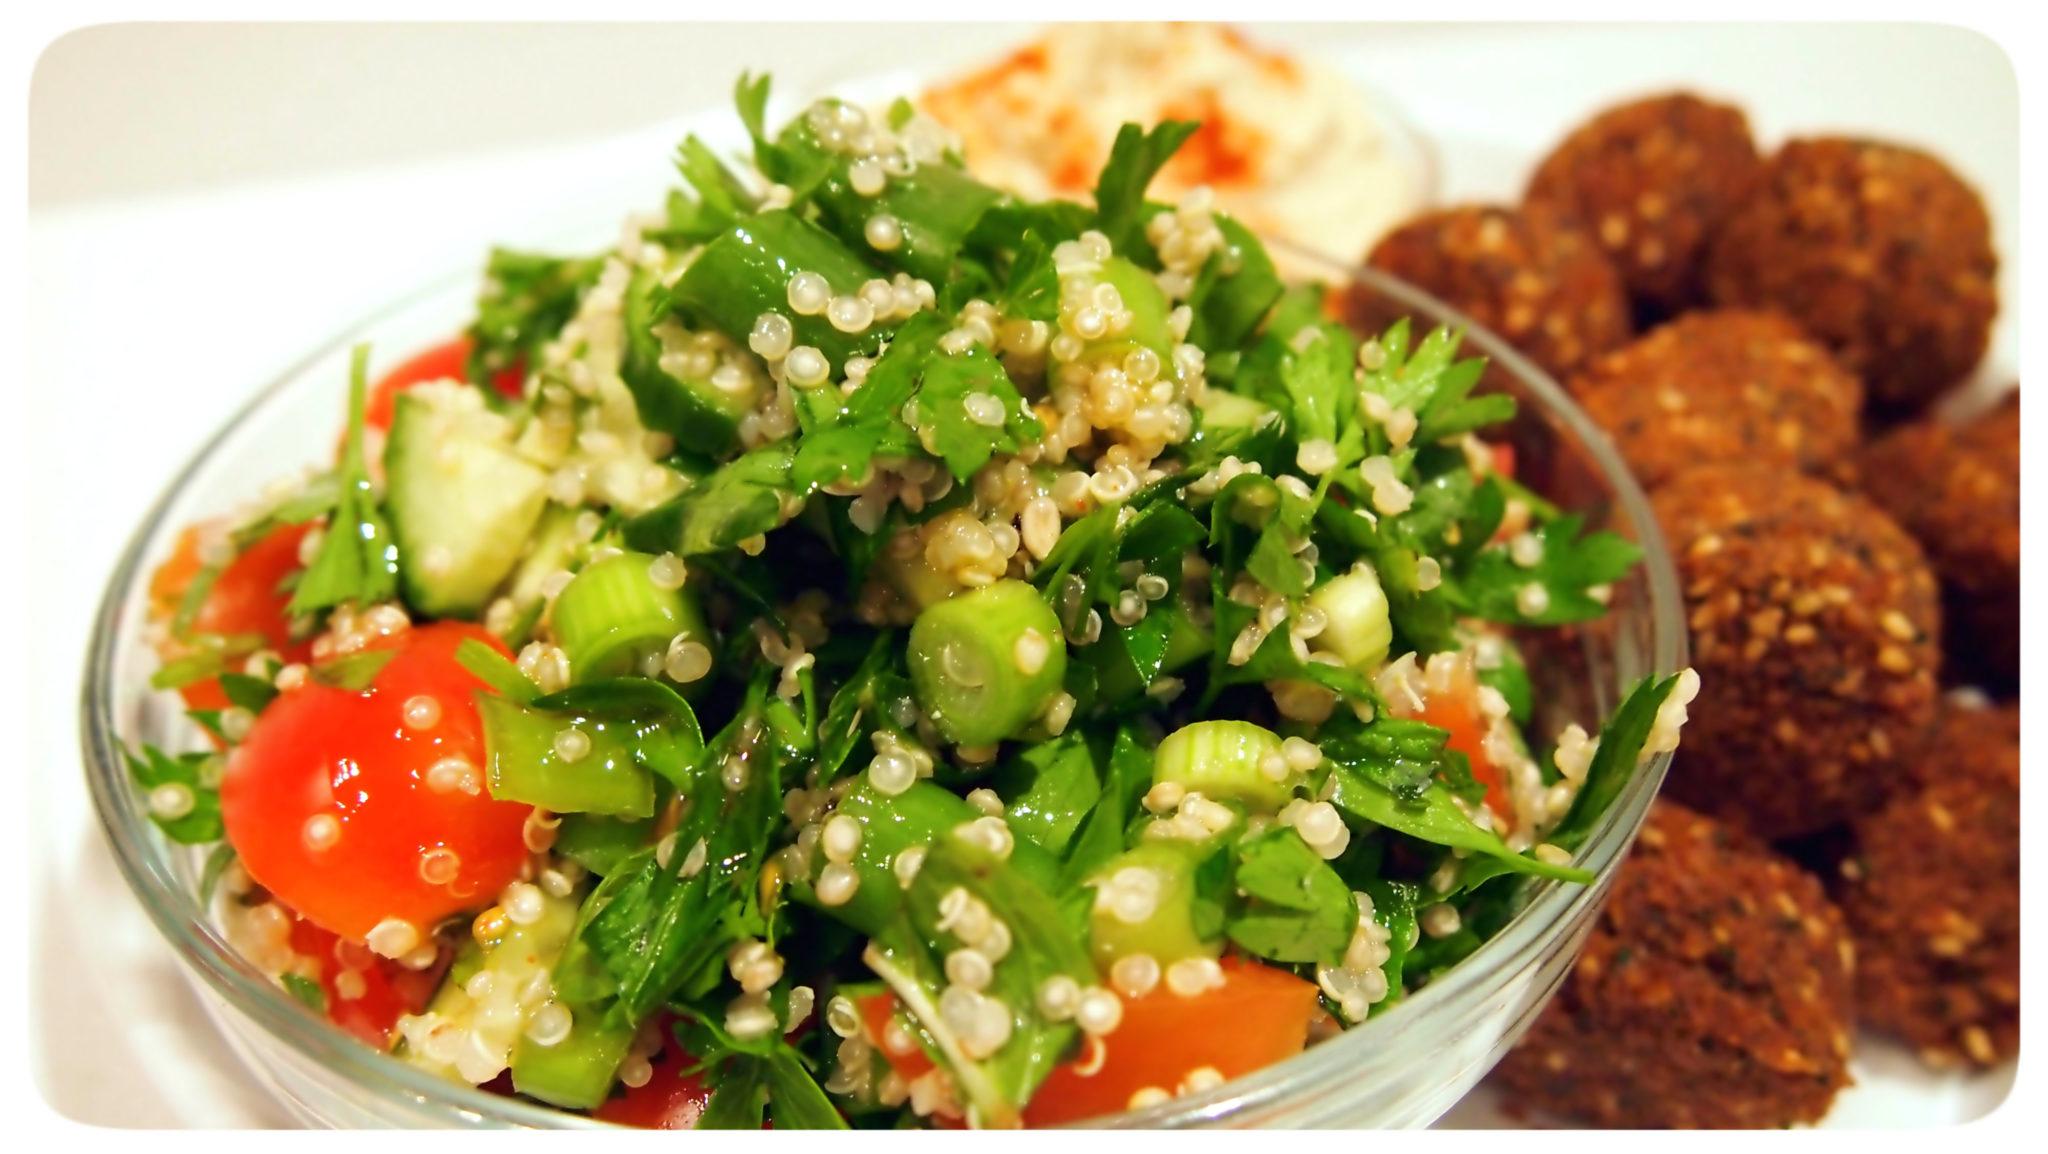 ... - Hummus and Quinoa Tabbouleh - Vegan Sparkles with Rebecca Weller